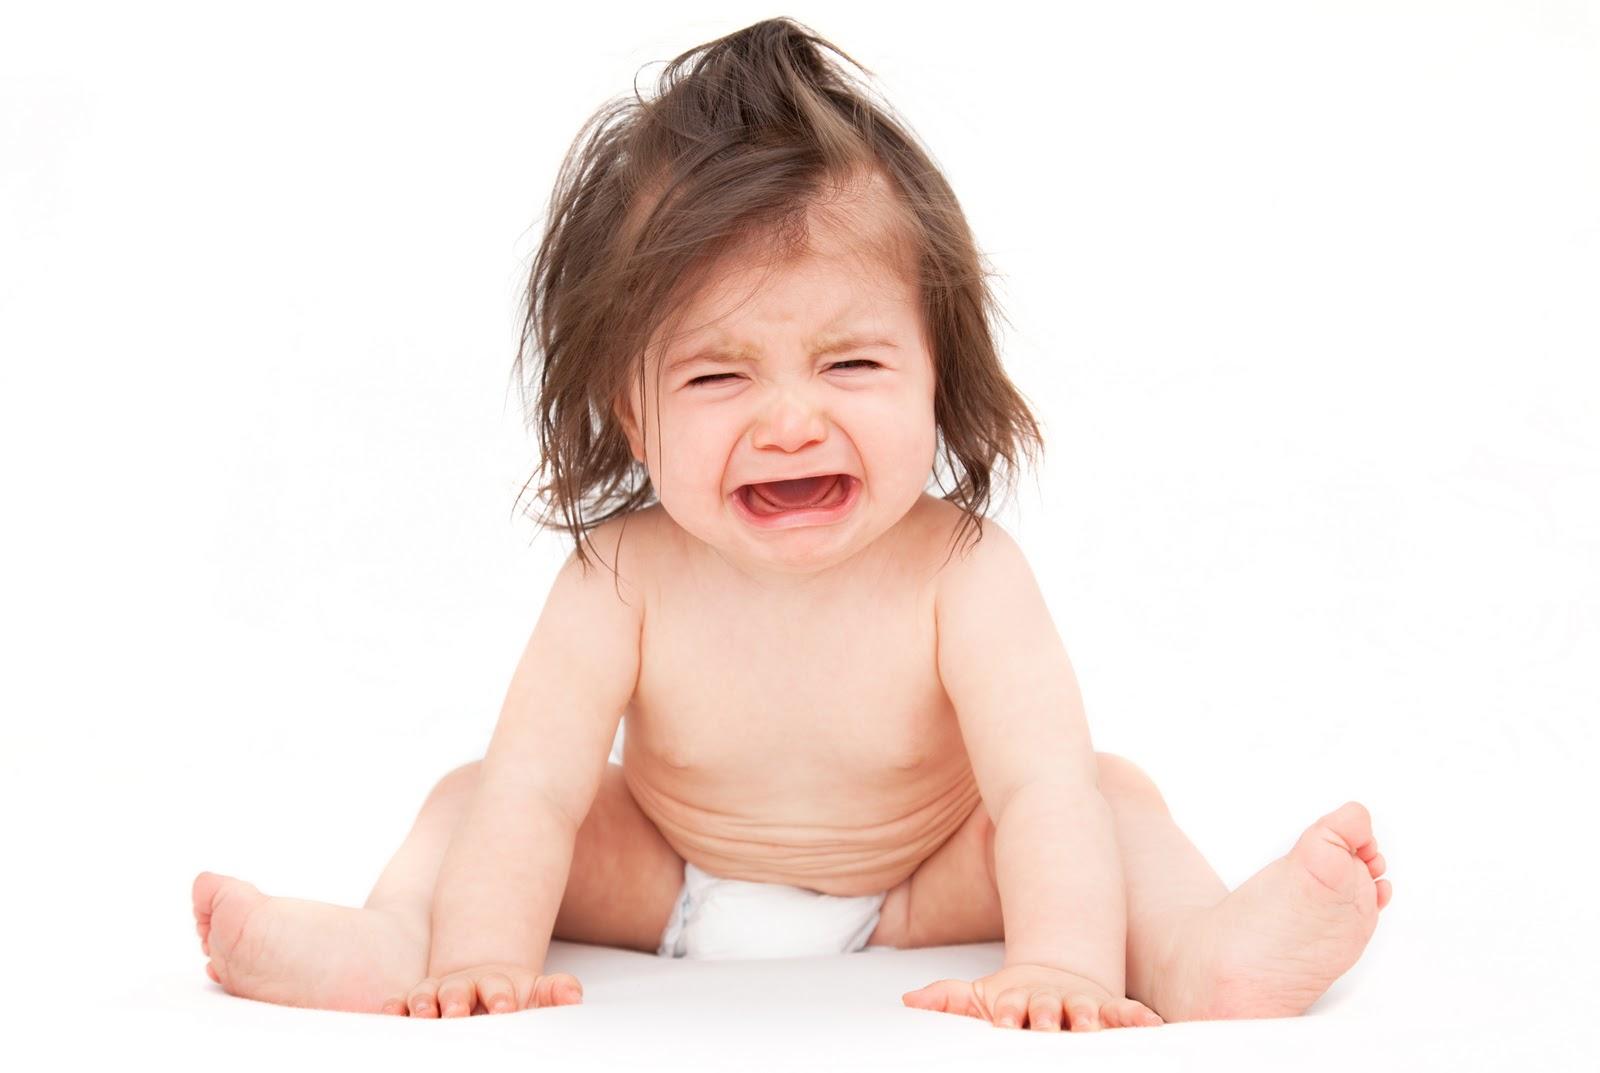 http://2.bp.blogspot.com/-hPCY-NGCCV8/TtyYnnhzobI/AAAAAAAAYXY/9XEeLTi1dU0/s1600/Babies+Wallpapers.jpg